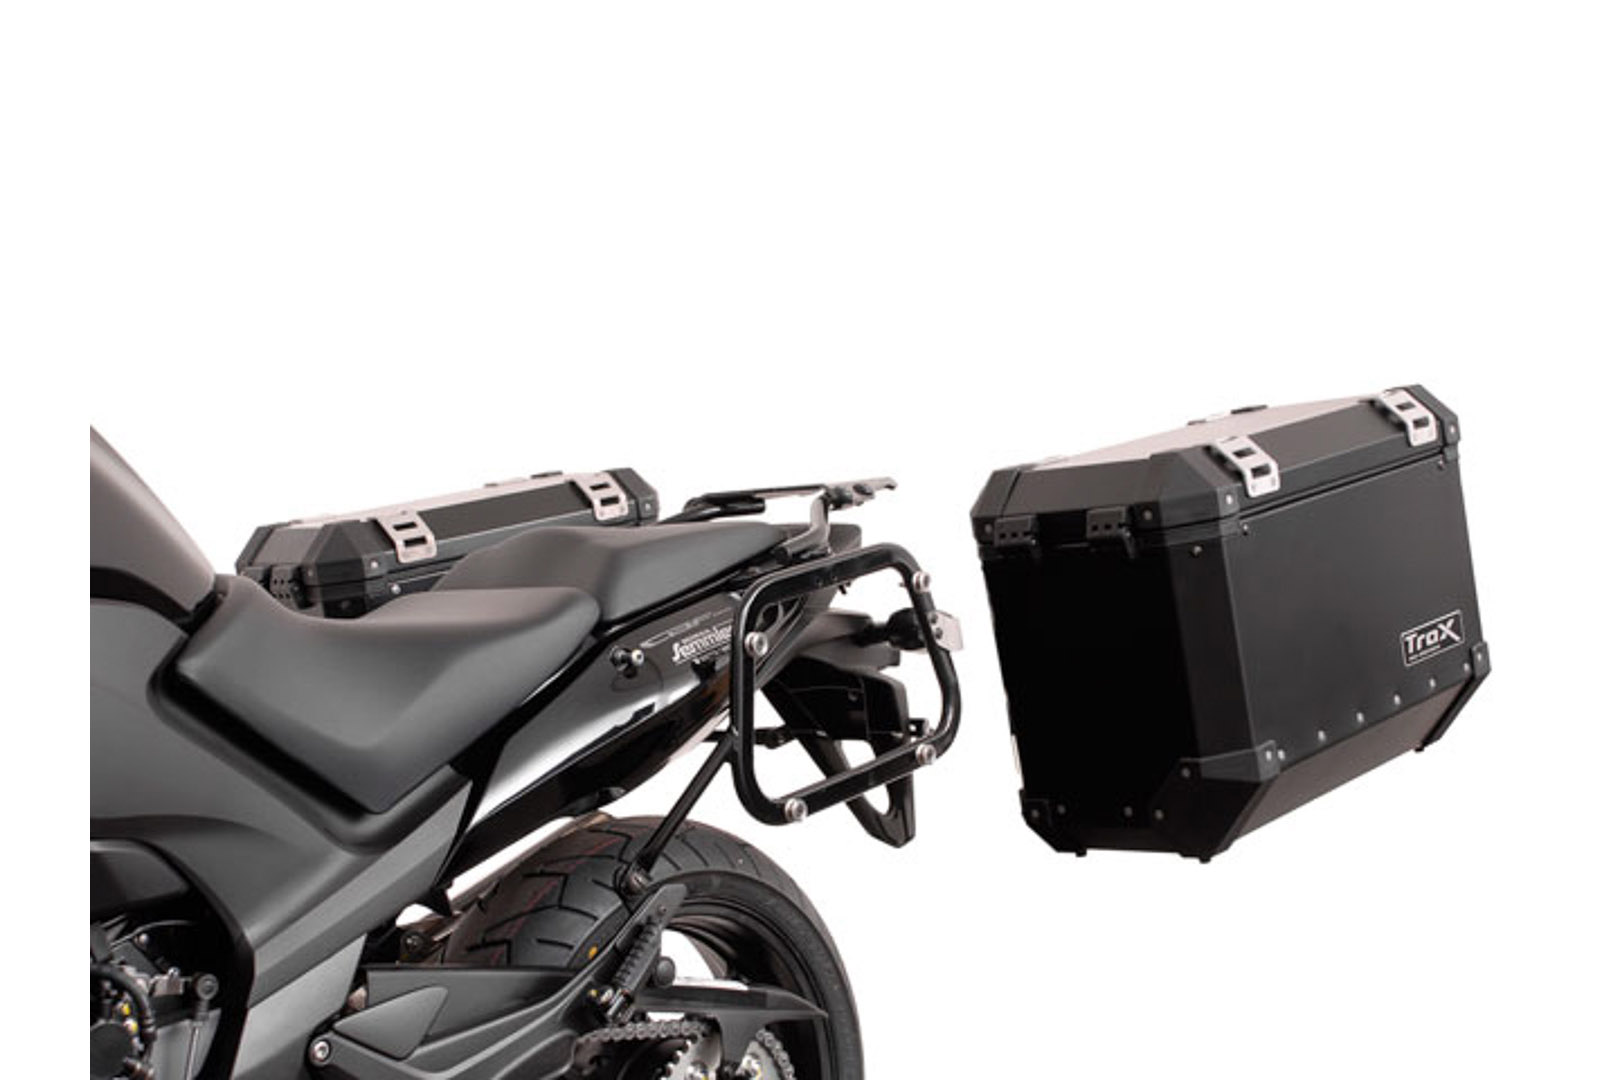 SW-Motech Quick-Lock EVO Sivutelinesarja. Honda CBF 1000 F (10-).